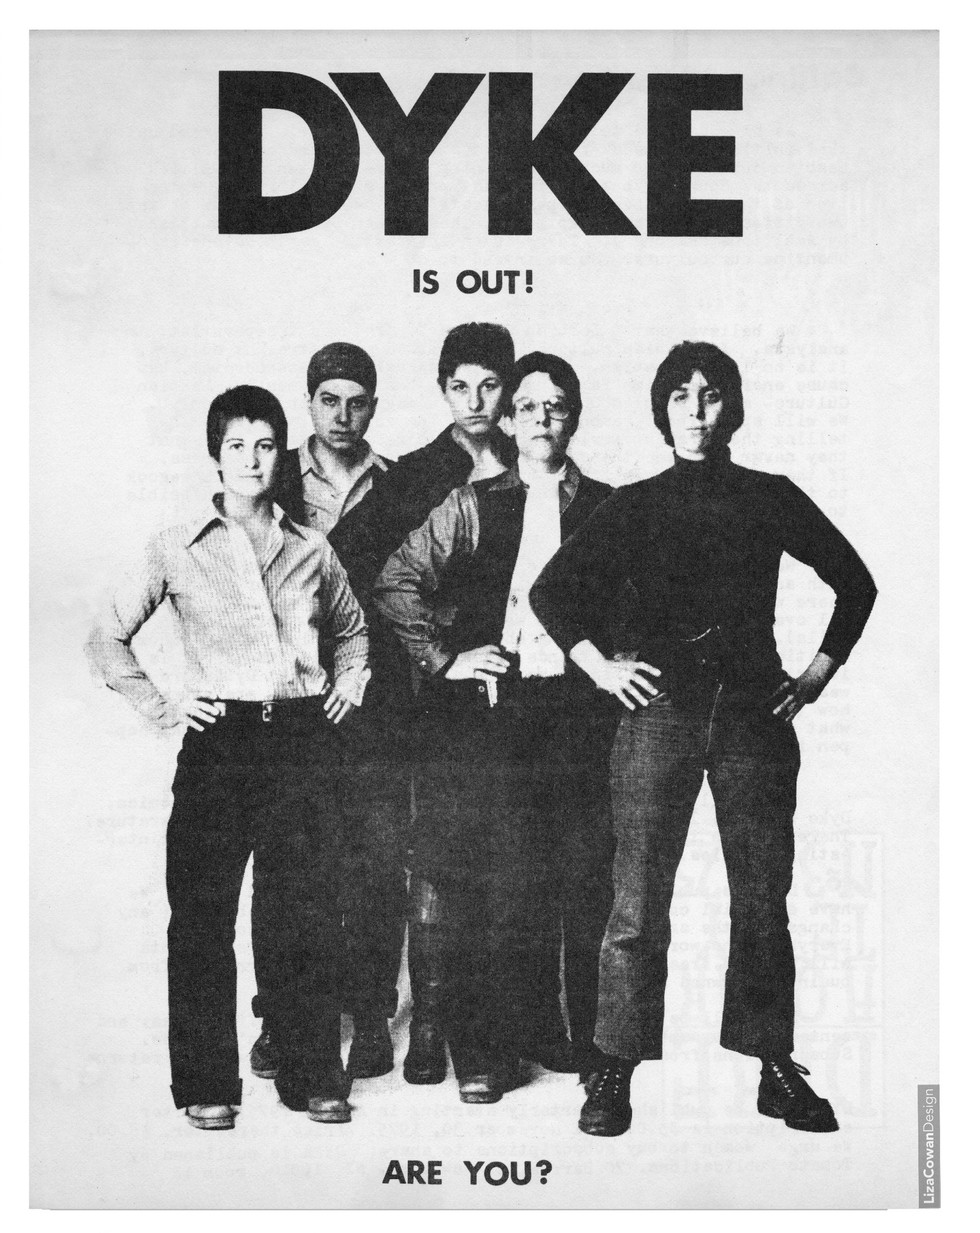 Liza Cowan, DYKE, A Quarterlyflyer. 1974.